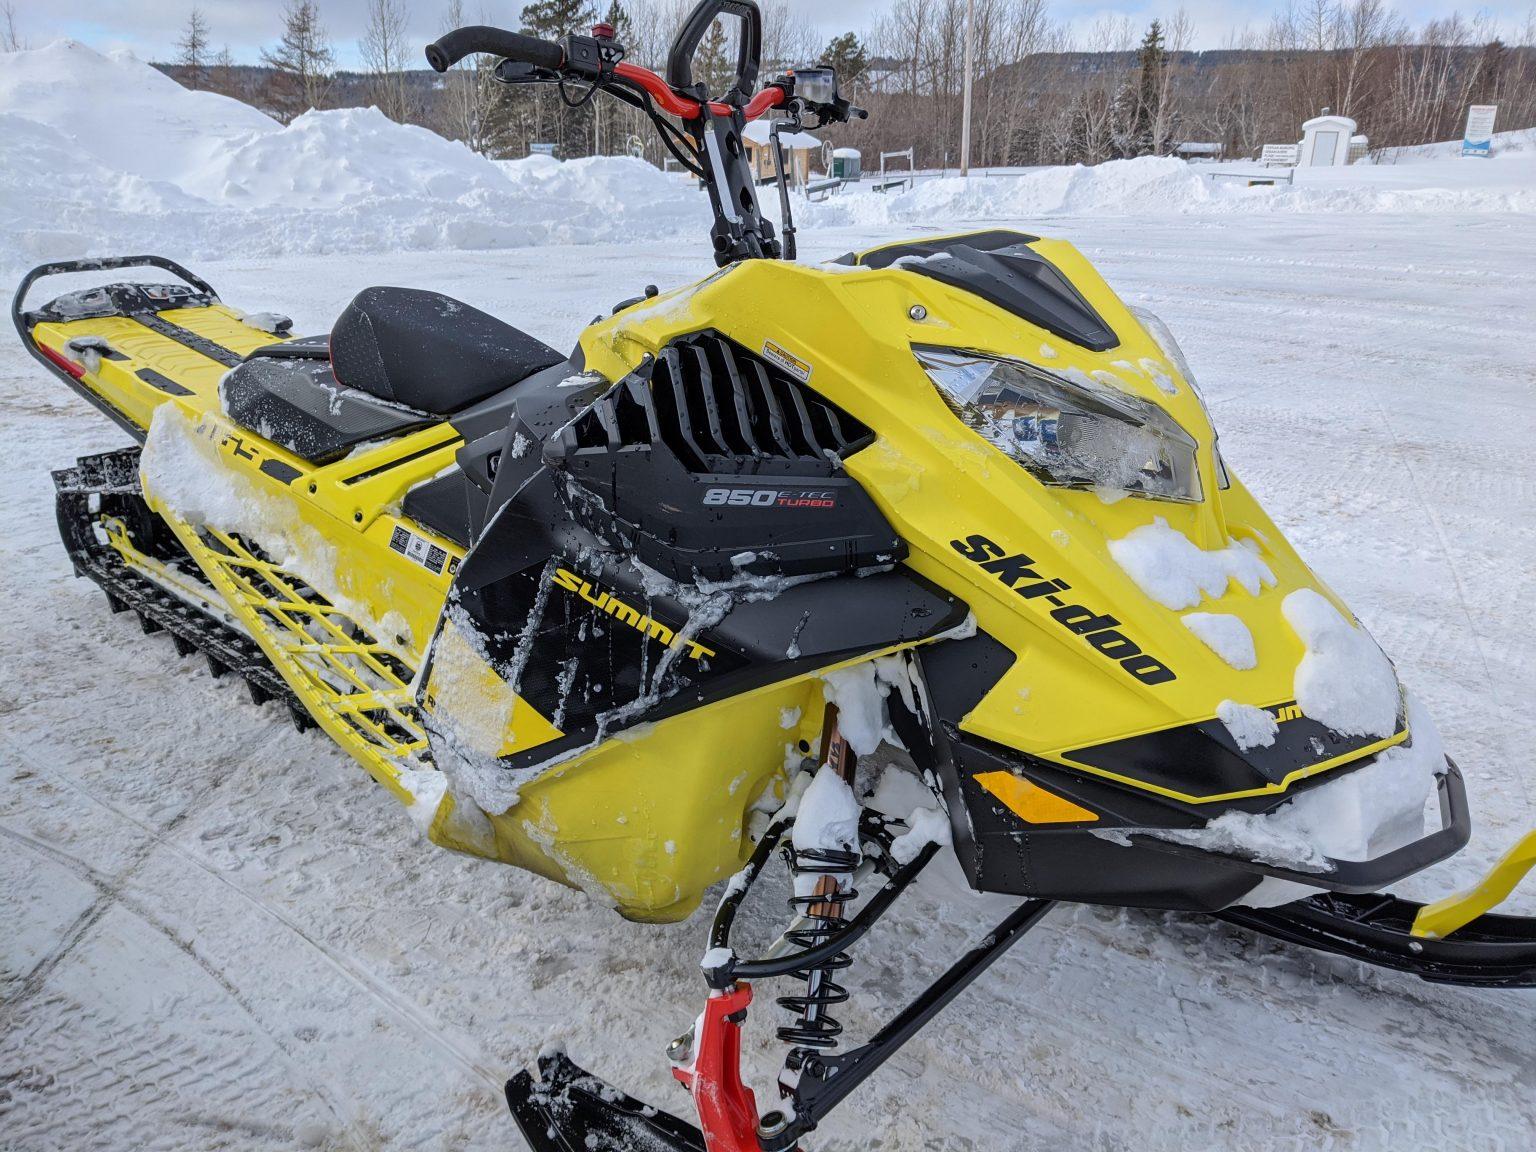 Essai du Ski-Doo Summit 850 E-TEC Turbo